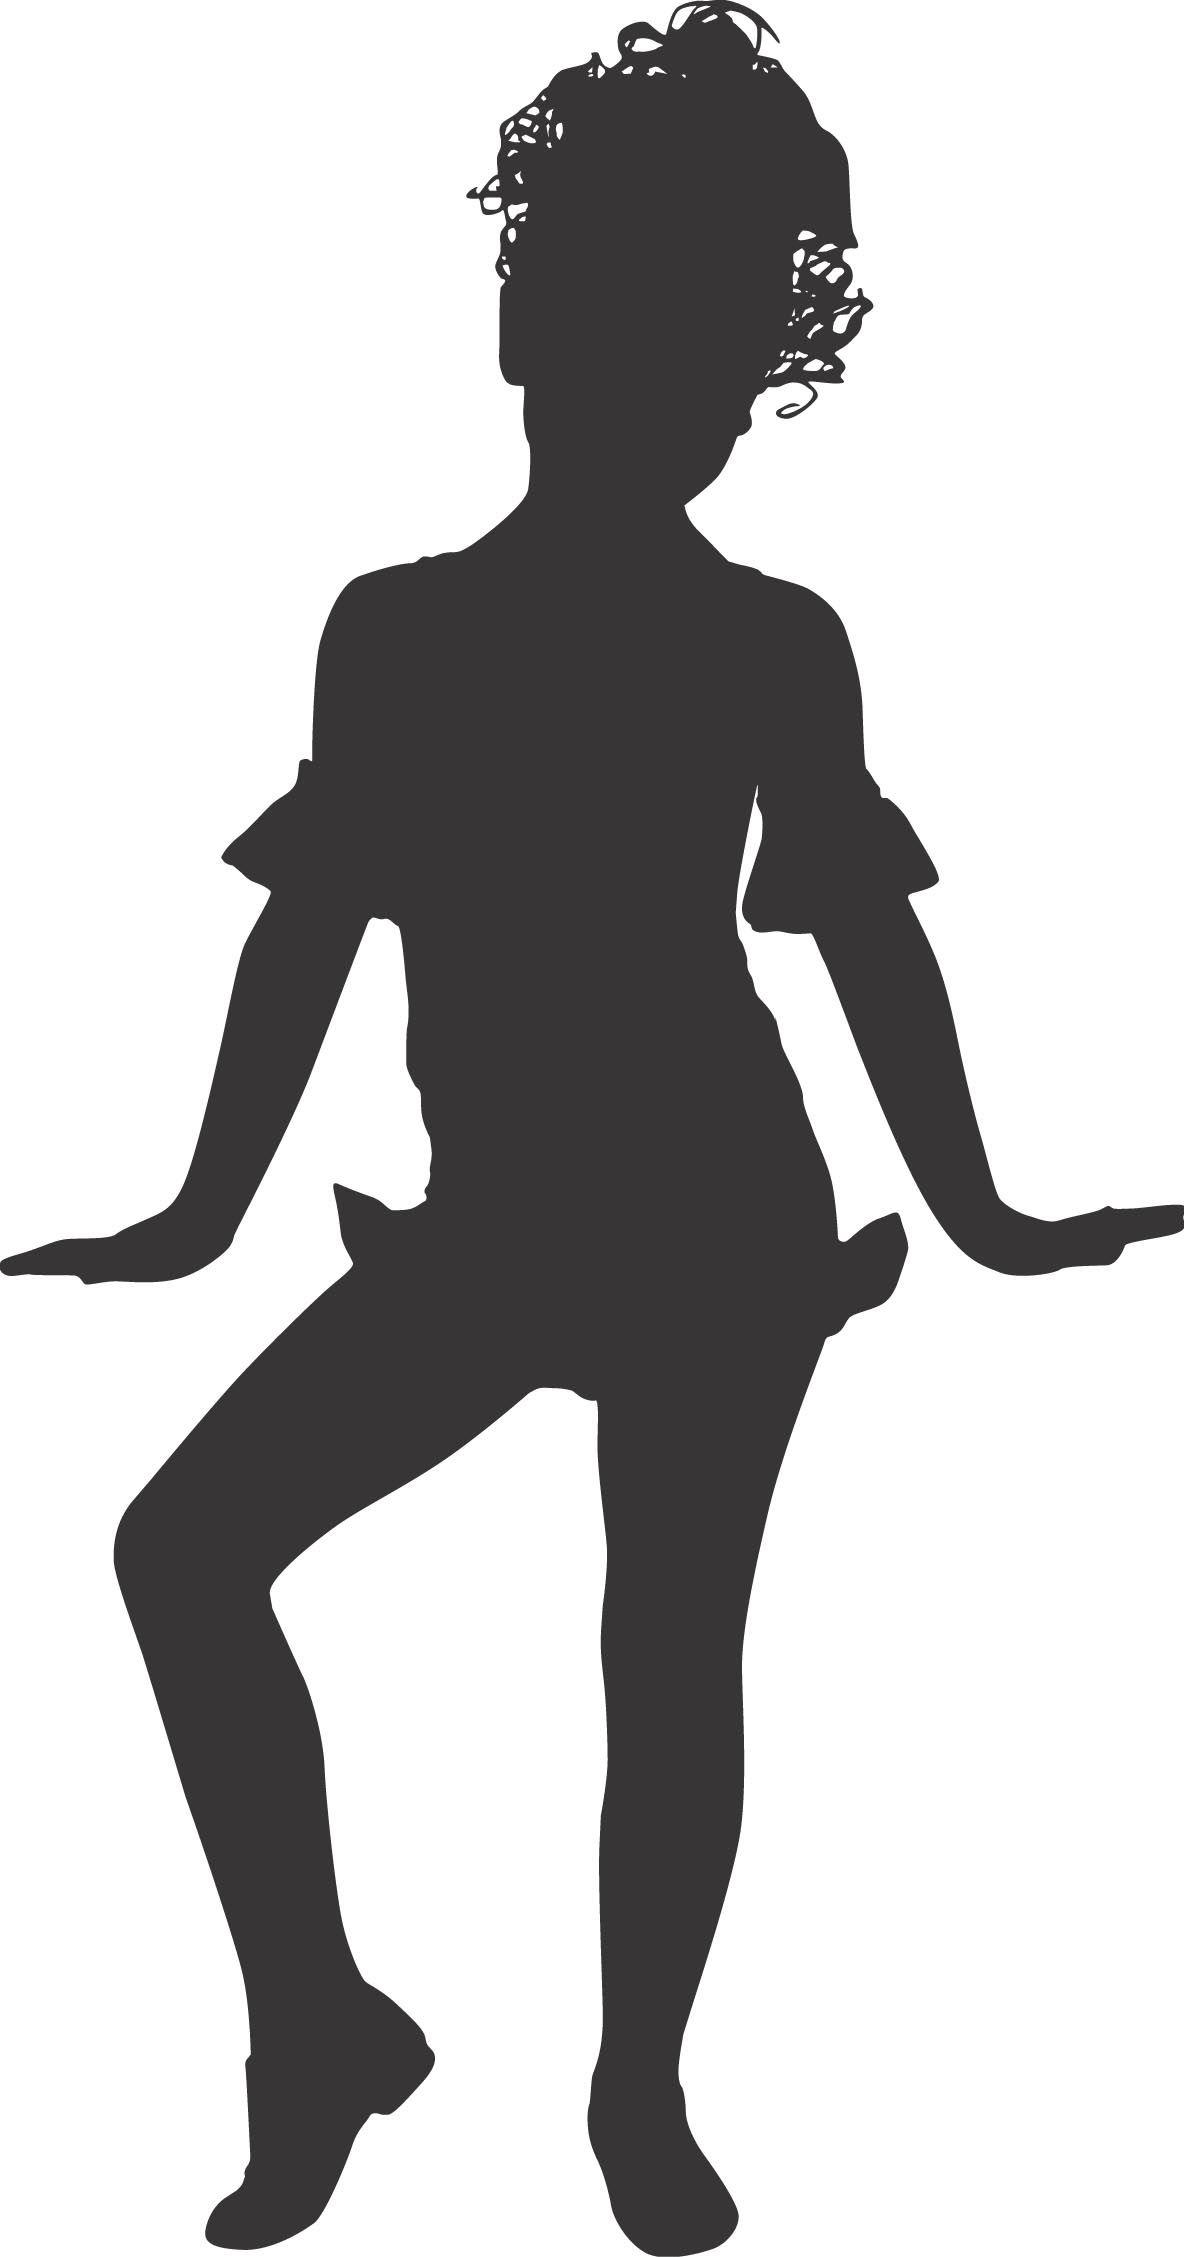 tap dance clip art tap is a fun rhythmic style dance tap develops rh pinterest com